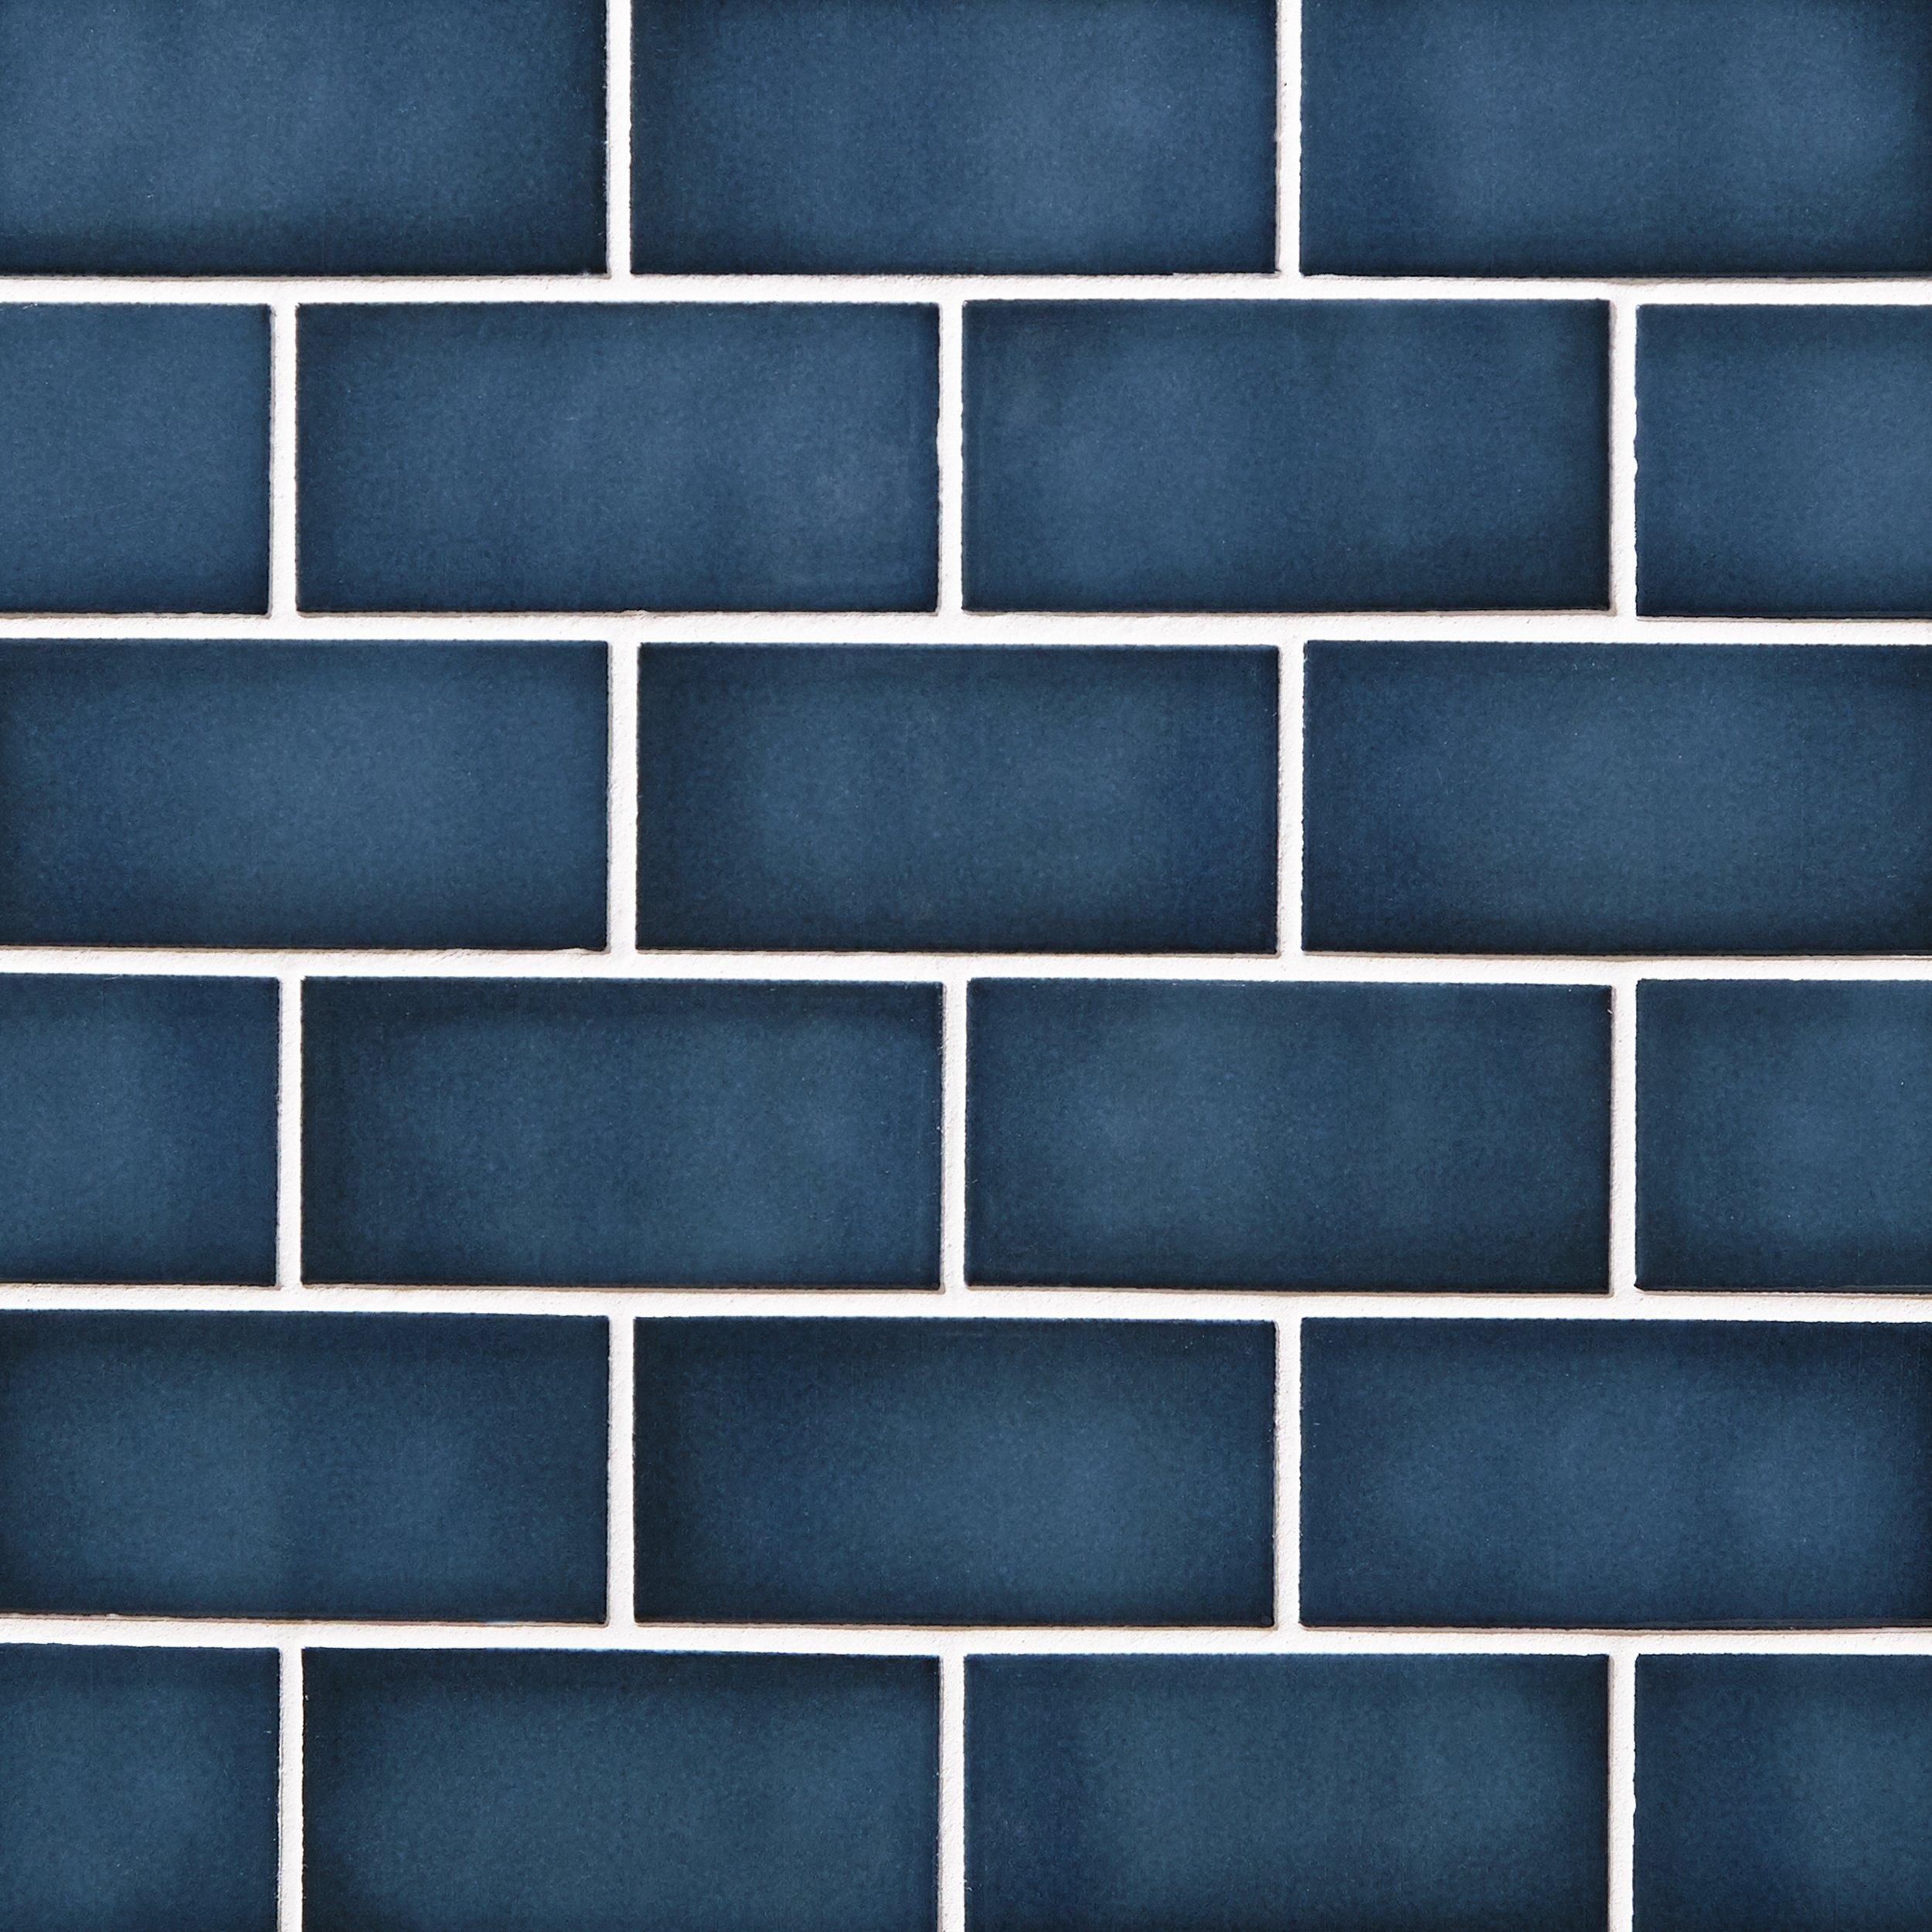 La Belle Antique Blue Polished Ceramic Mosaic In 2020 Blue Kitchen Tiles Blue Subway Tile Blue Glass Tile